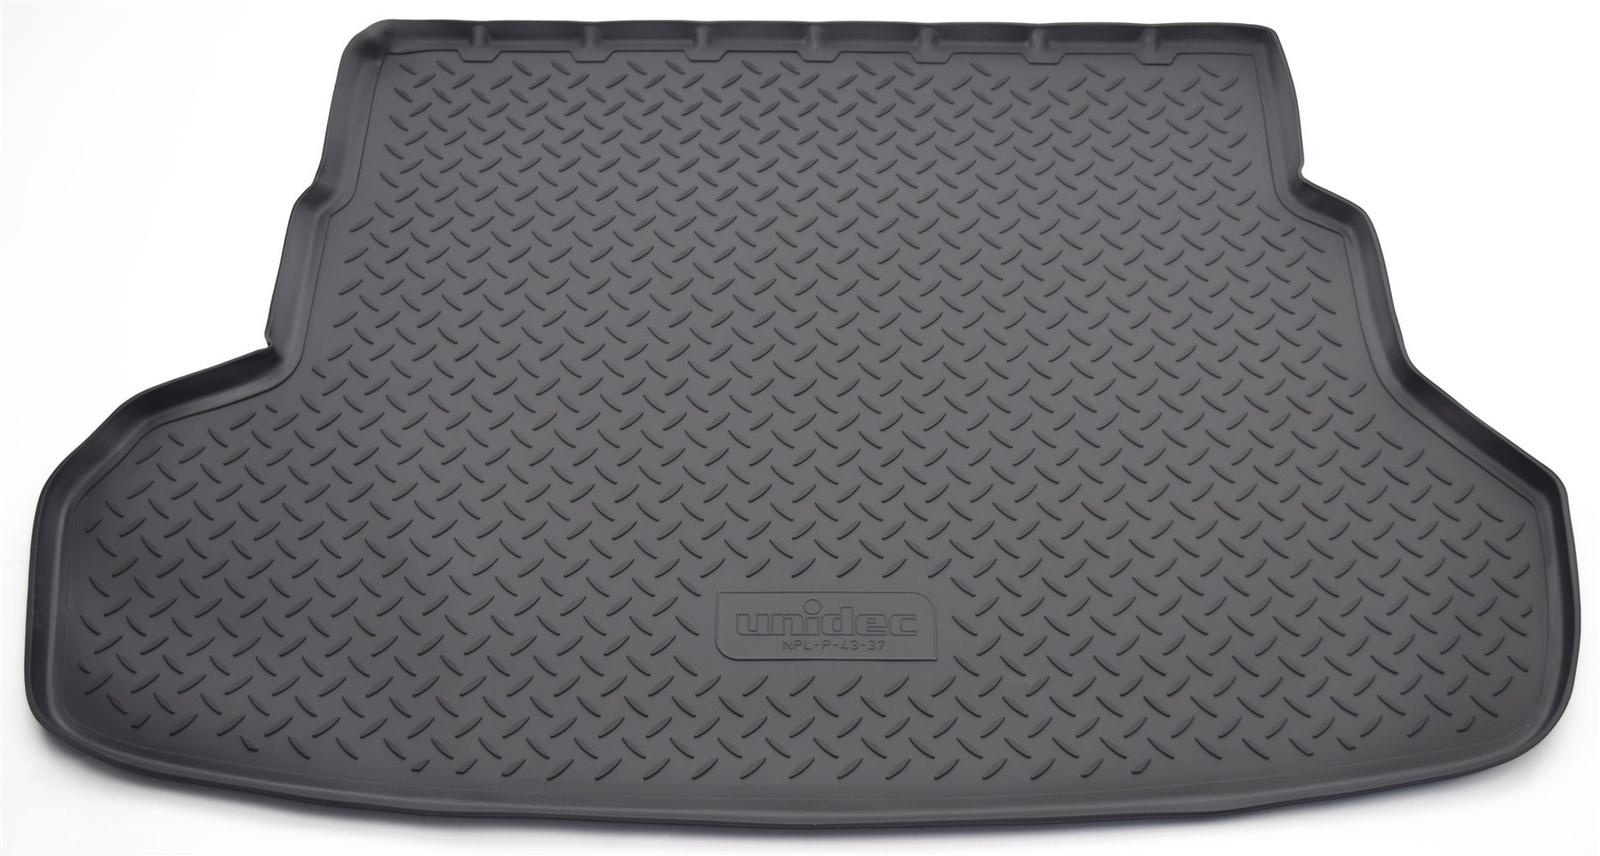 Коврик багажника Norplast для Kia Rio RUSQB SD 2011, NPL-P-43-37, черный